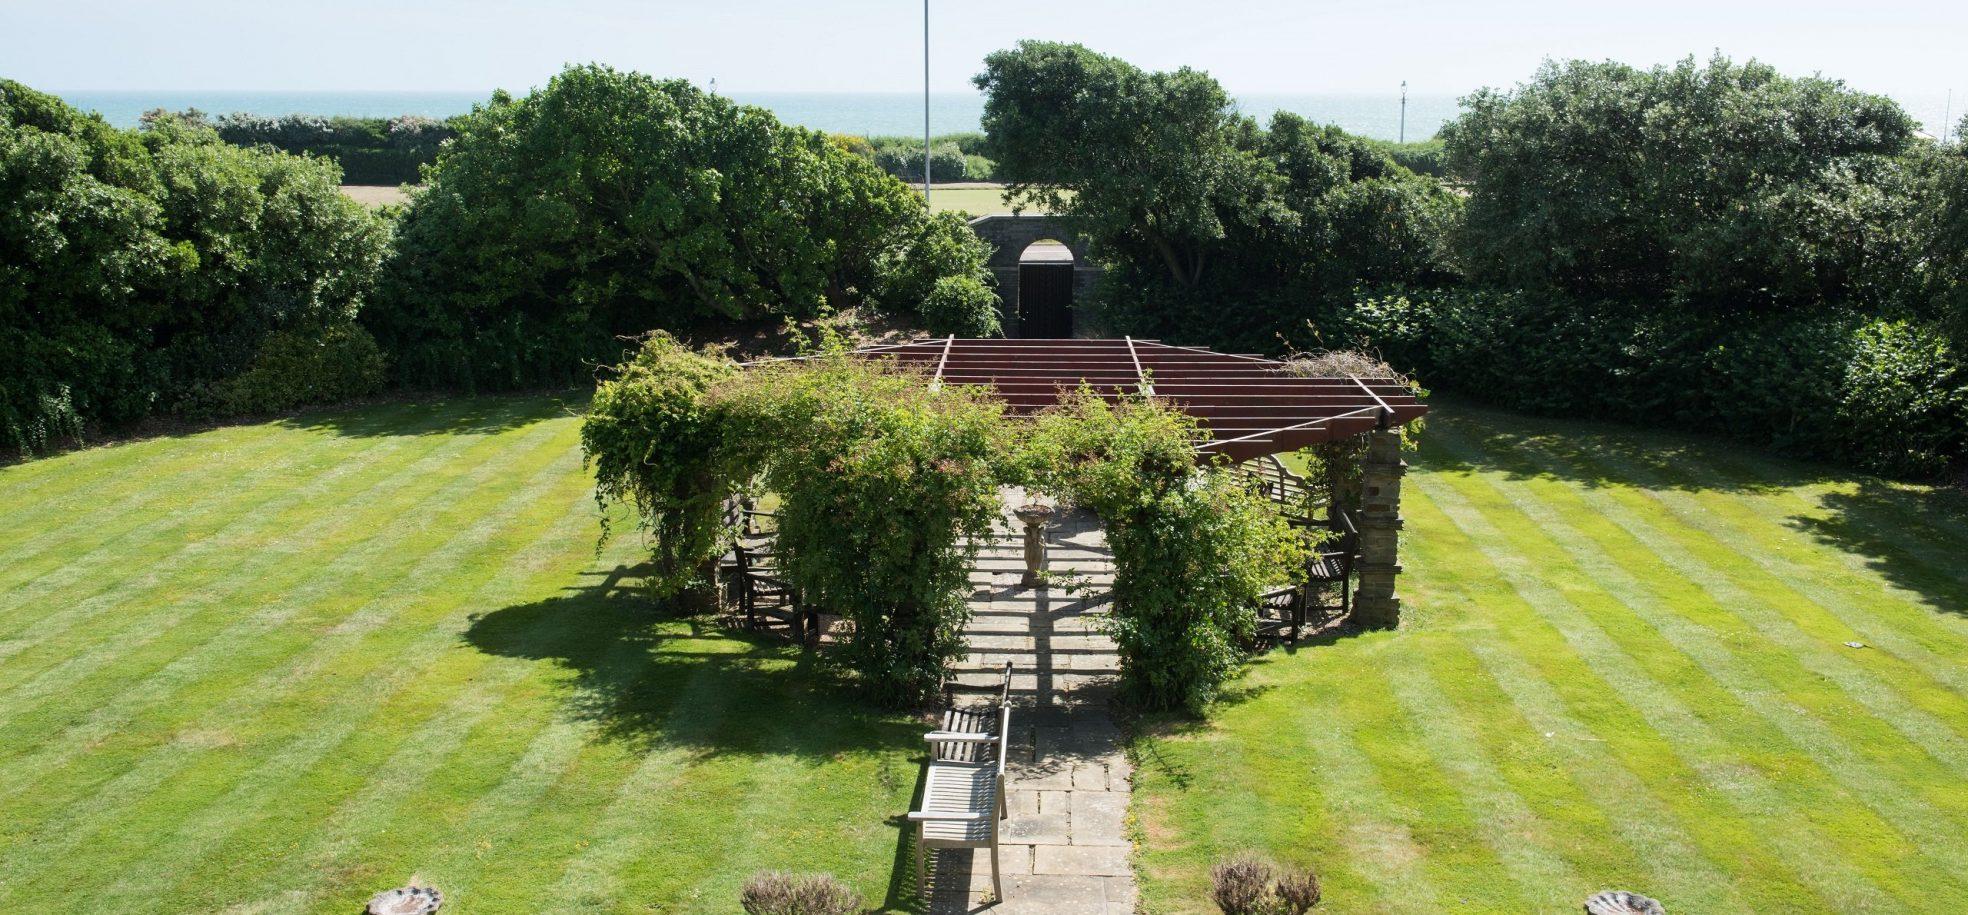 Gardens and pergola at Barford Court